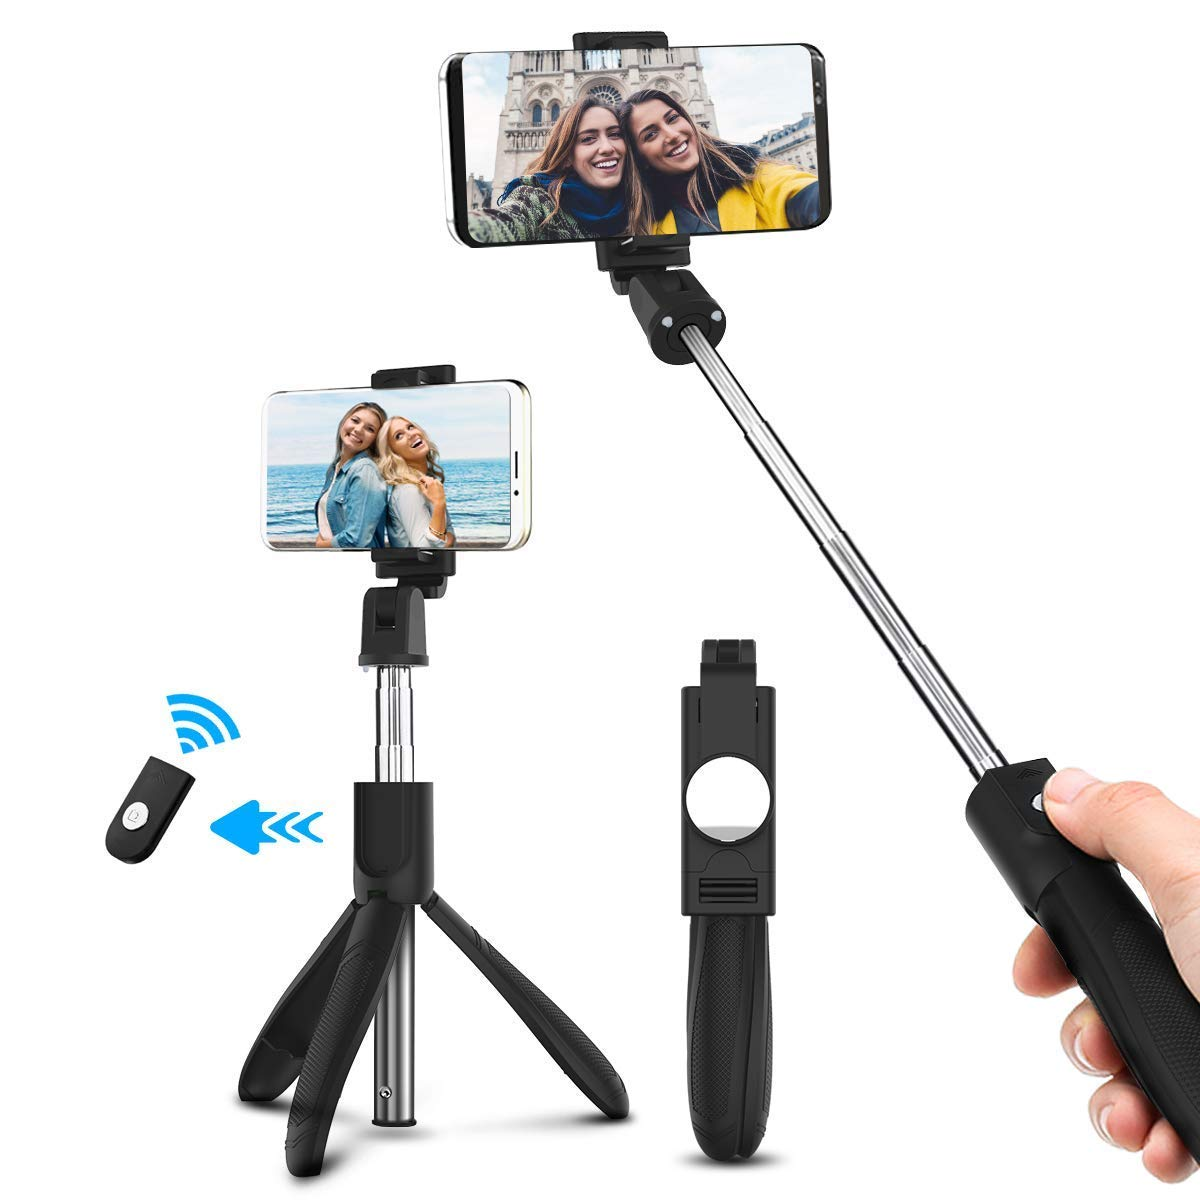 6bdf1cf5c28 Comprar ELEGIANT Palo Selfie Móvil Stick Bluetooth con Trípode ...